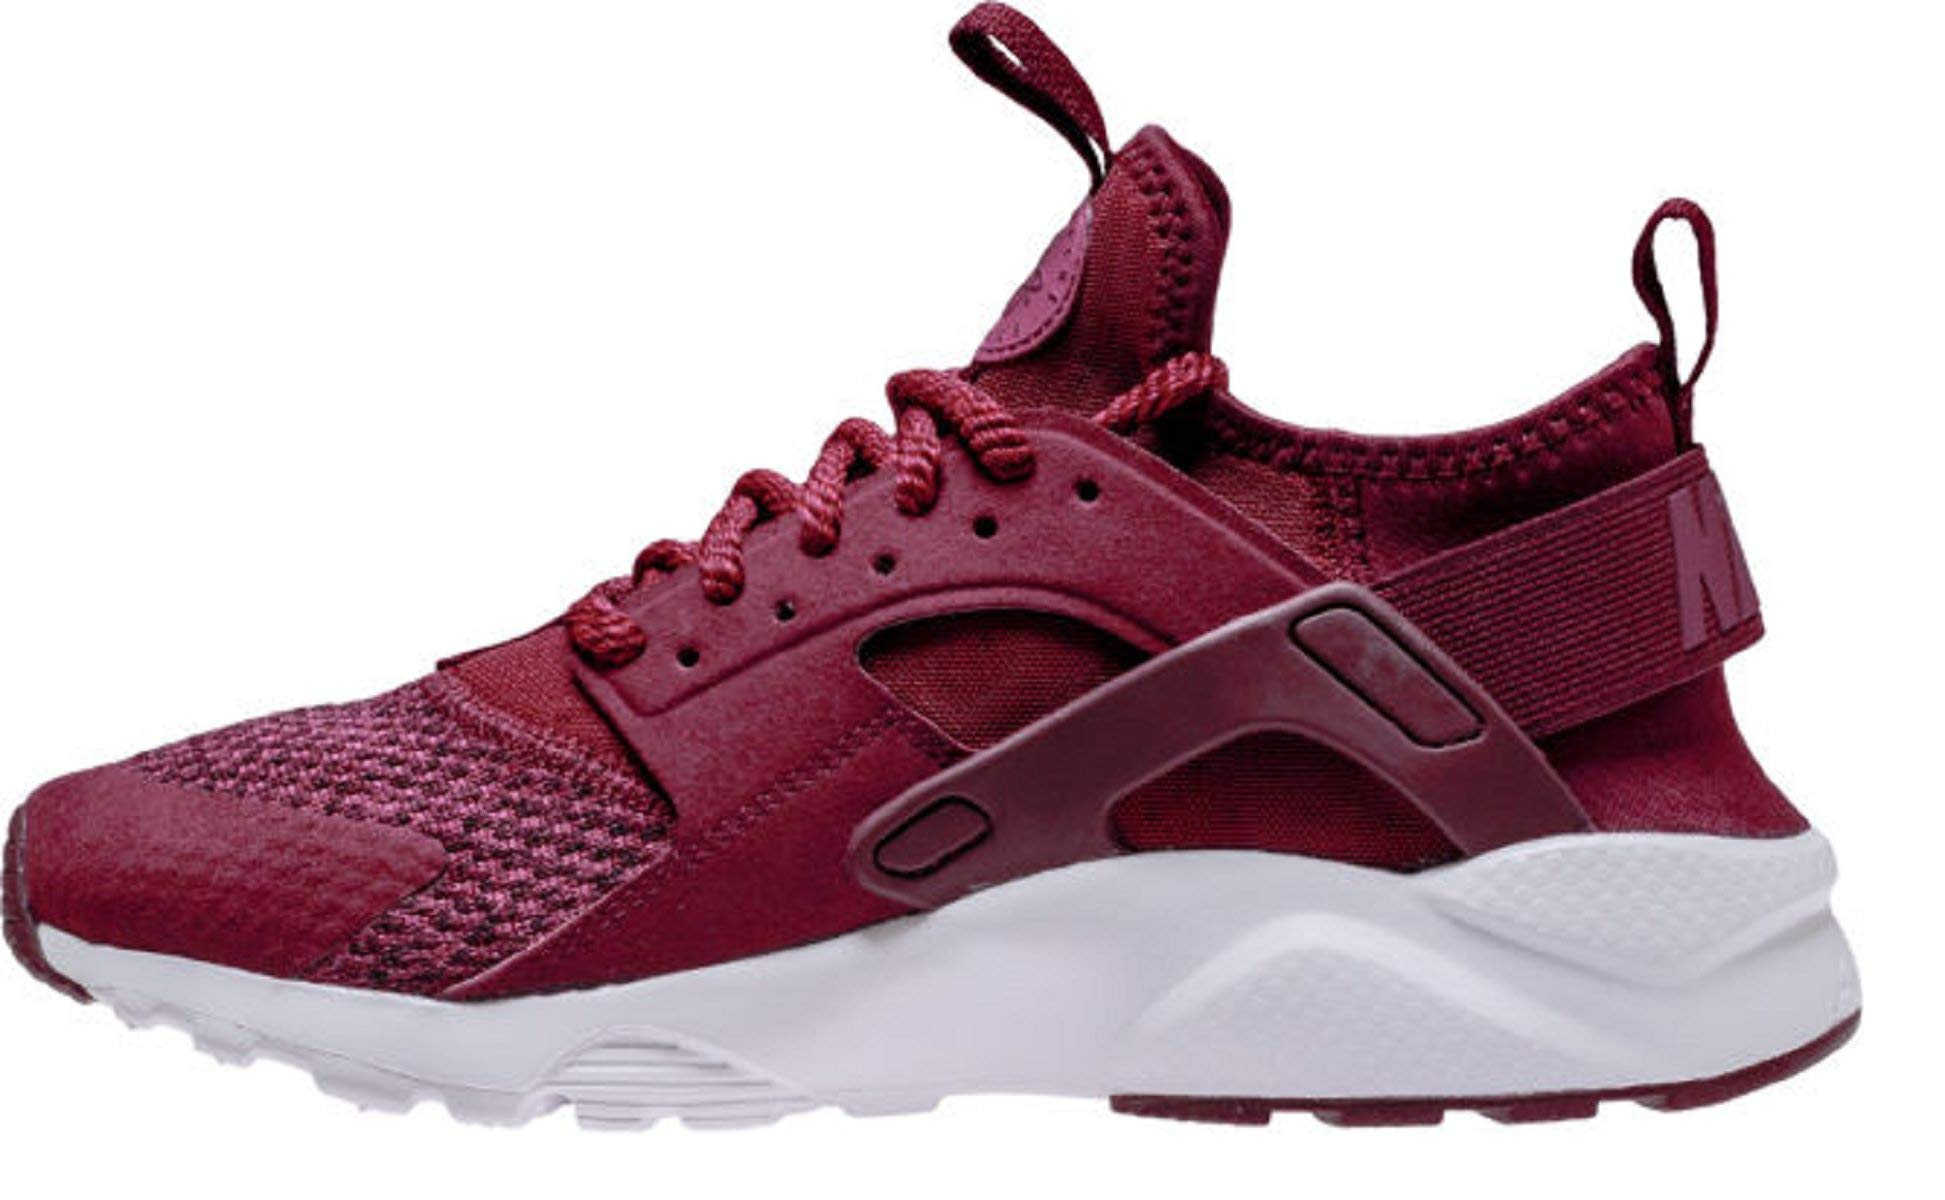 d6abd4439e4cc NIKE Huarache Run Ultra SE Boys Fashion-Sneakers 942121-600 6Y - Burgundy